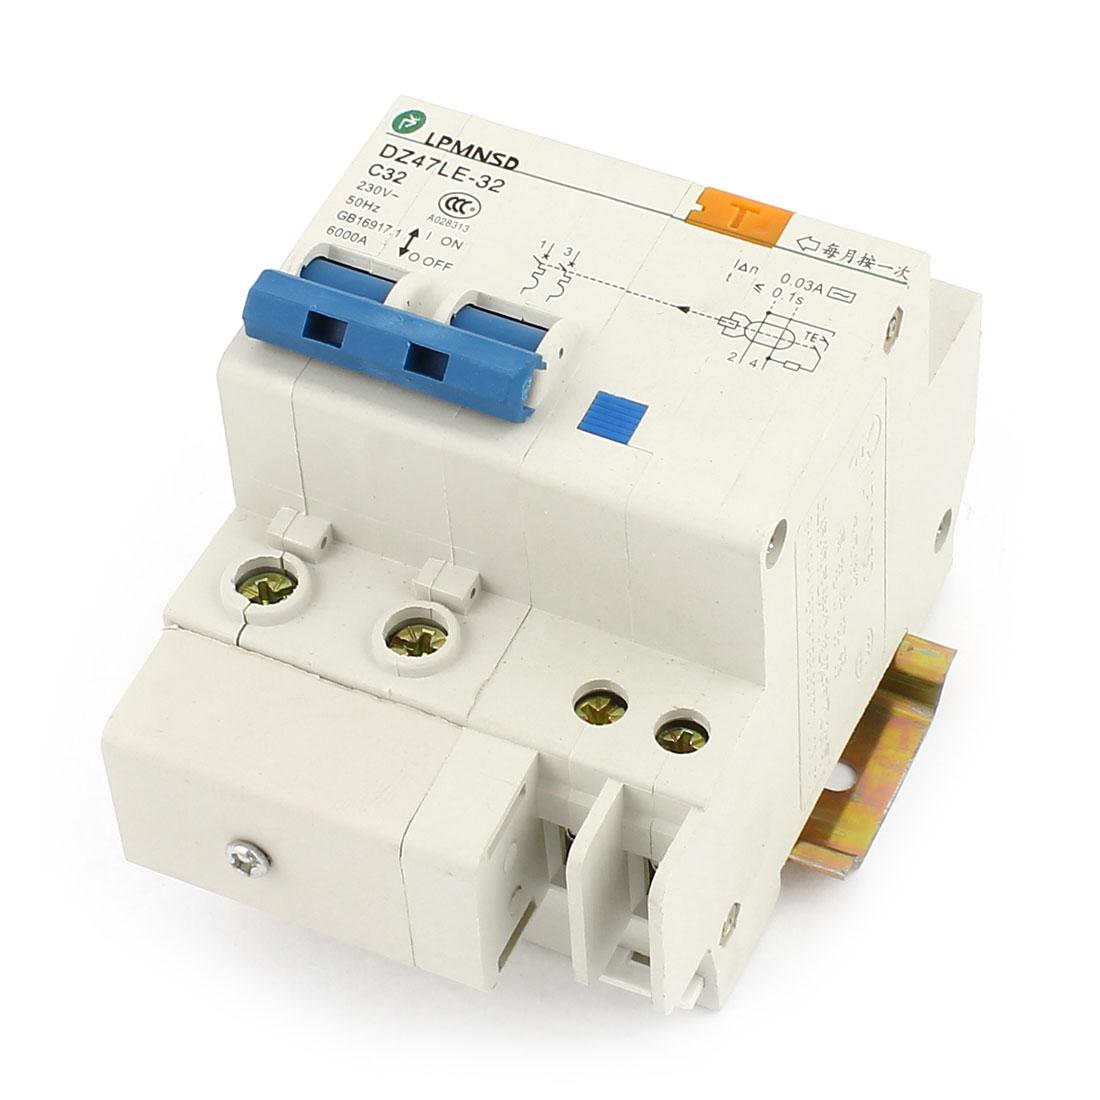 230V 32A DZ47LE-32 2 Phase 6kA Overload Circuit Breaker w Lead Rail